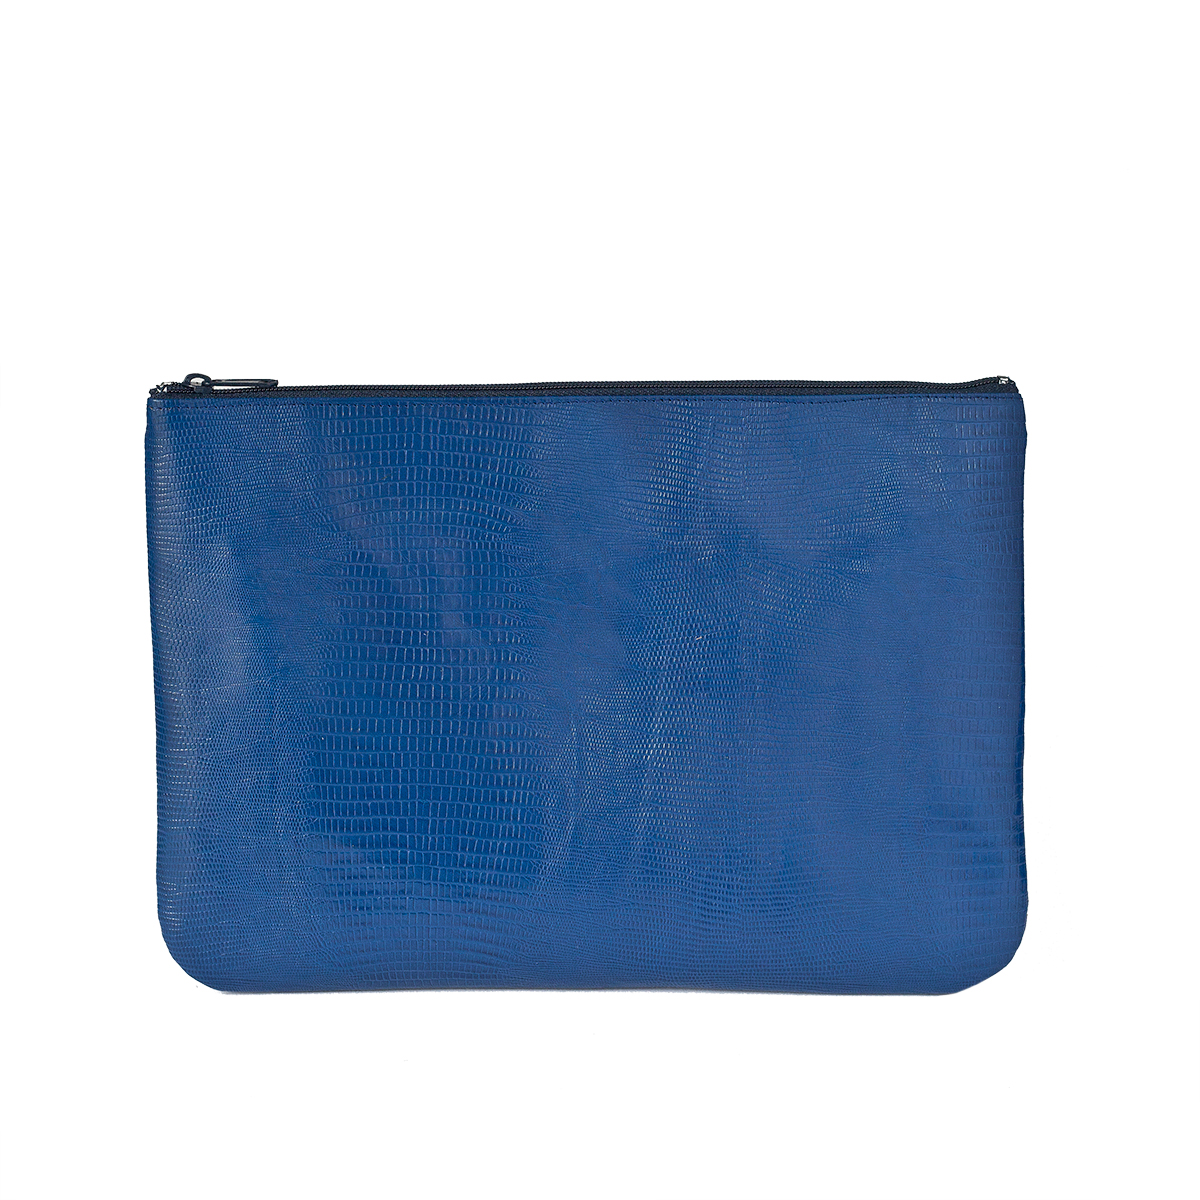 Grande pochette zippée bleu roi en cuir façon lézard